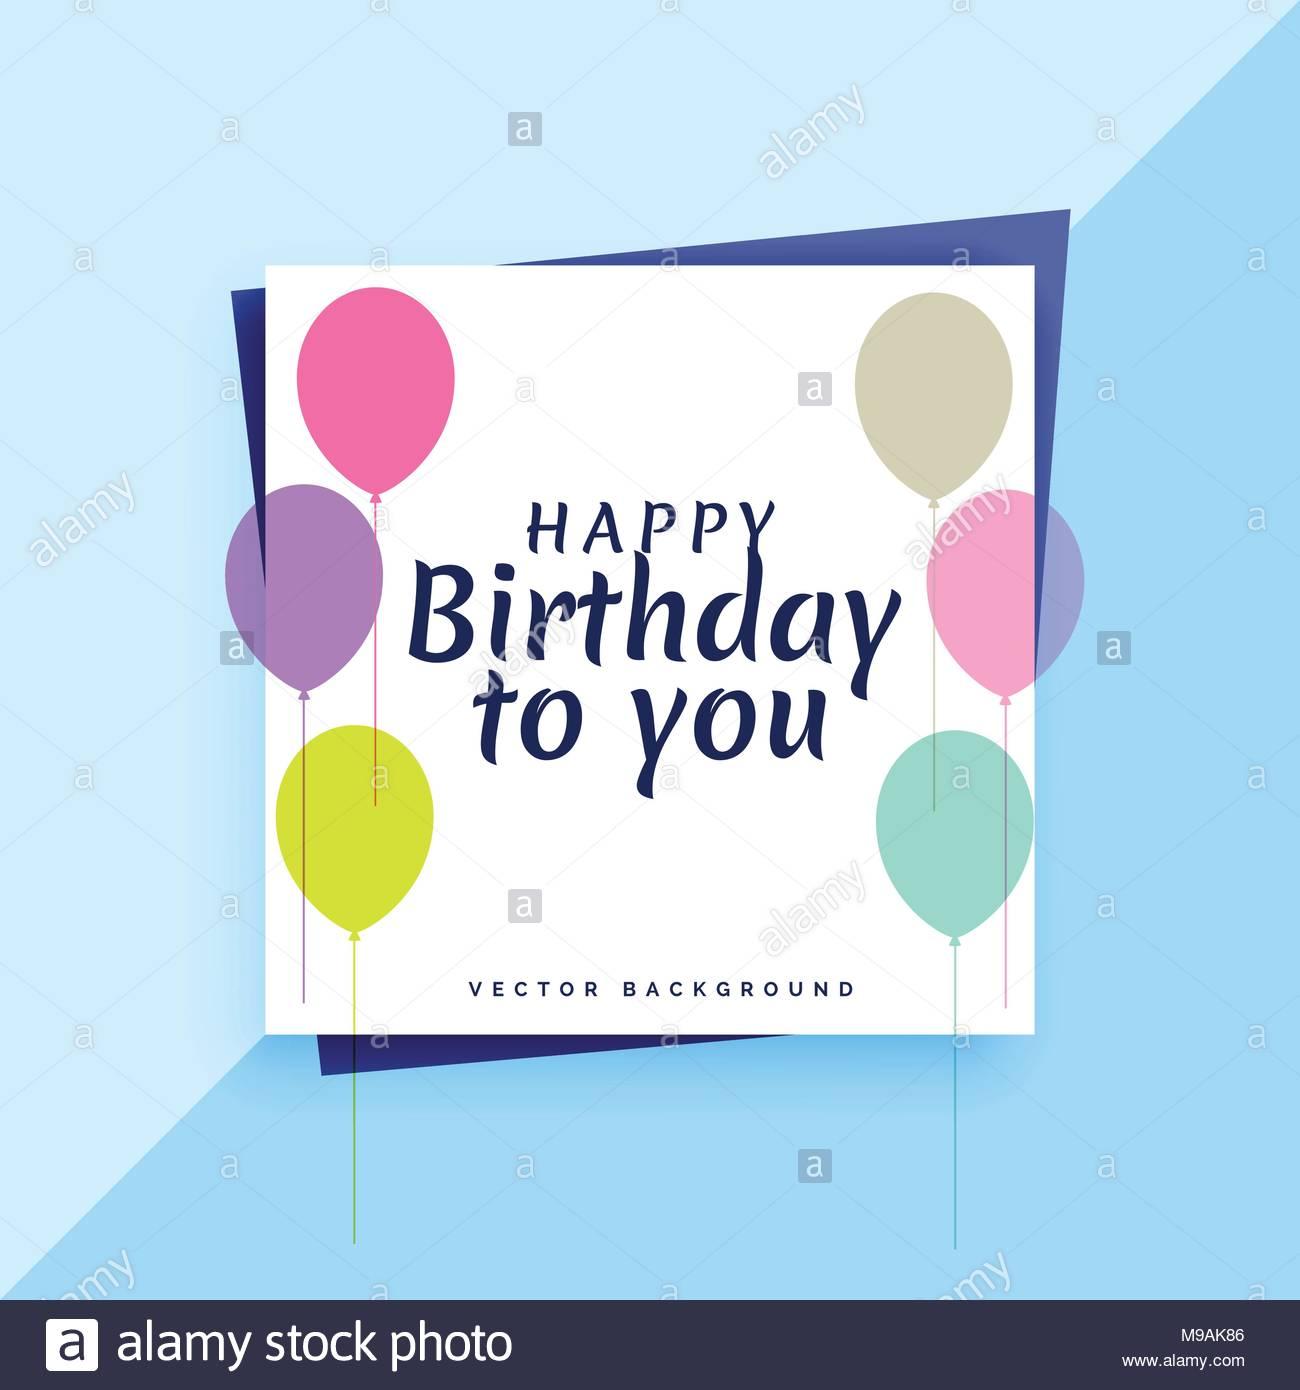 Elegante Happy Birthday Card Design Mit Bunten Luftballons Vektor